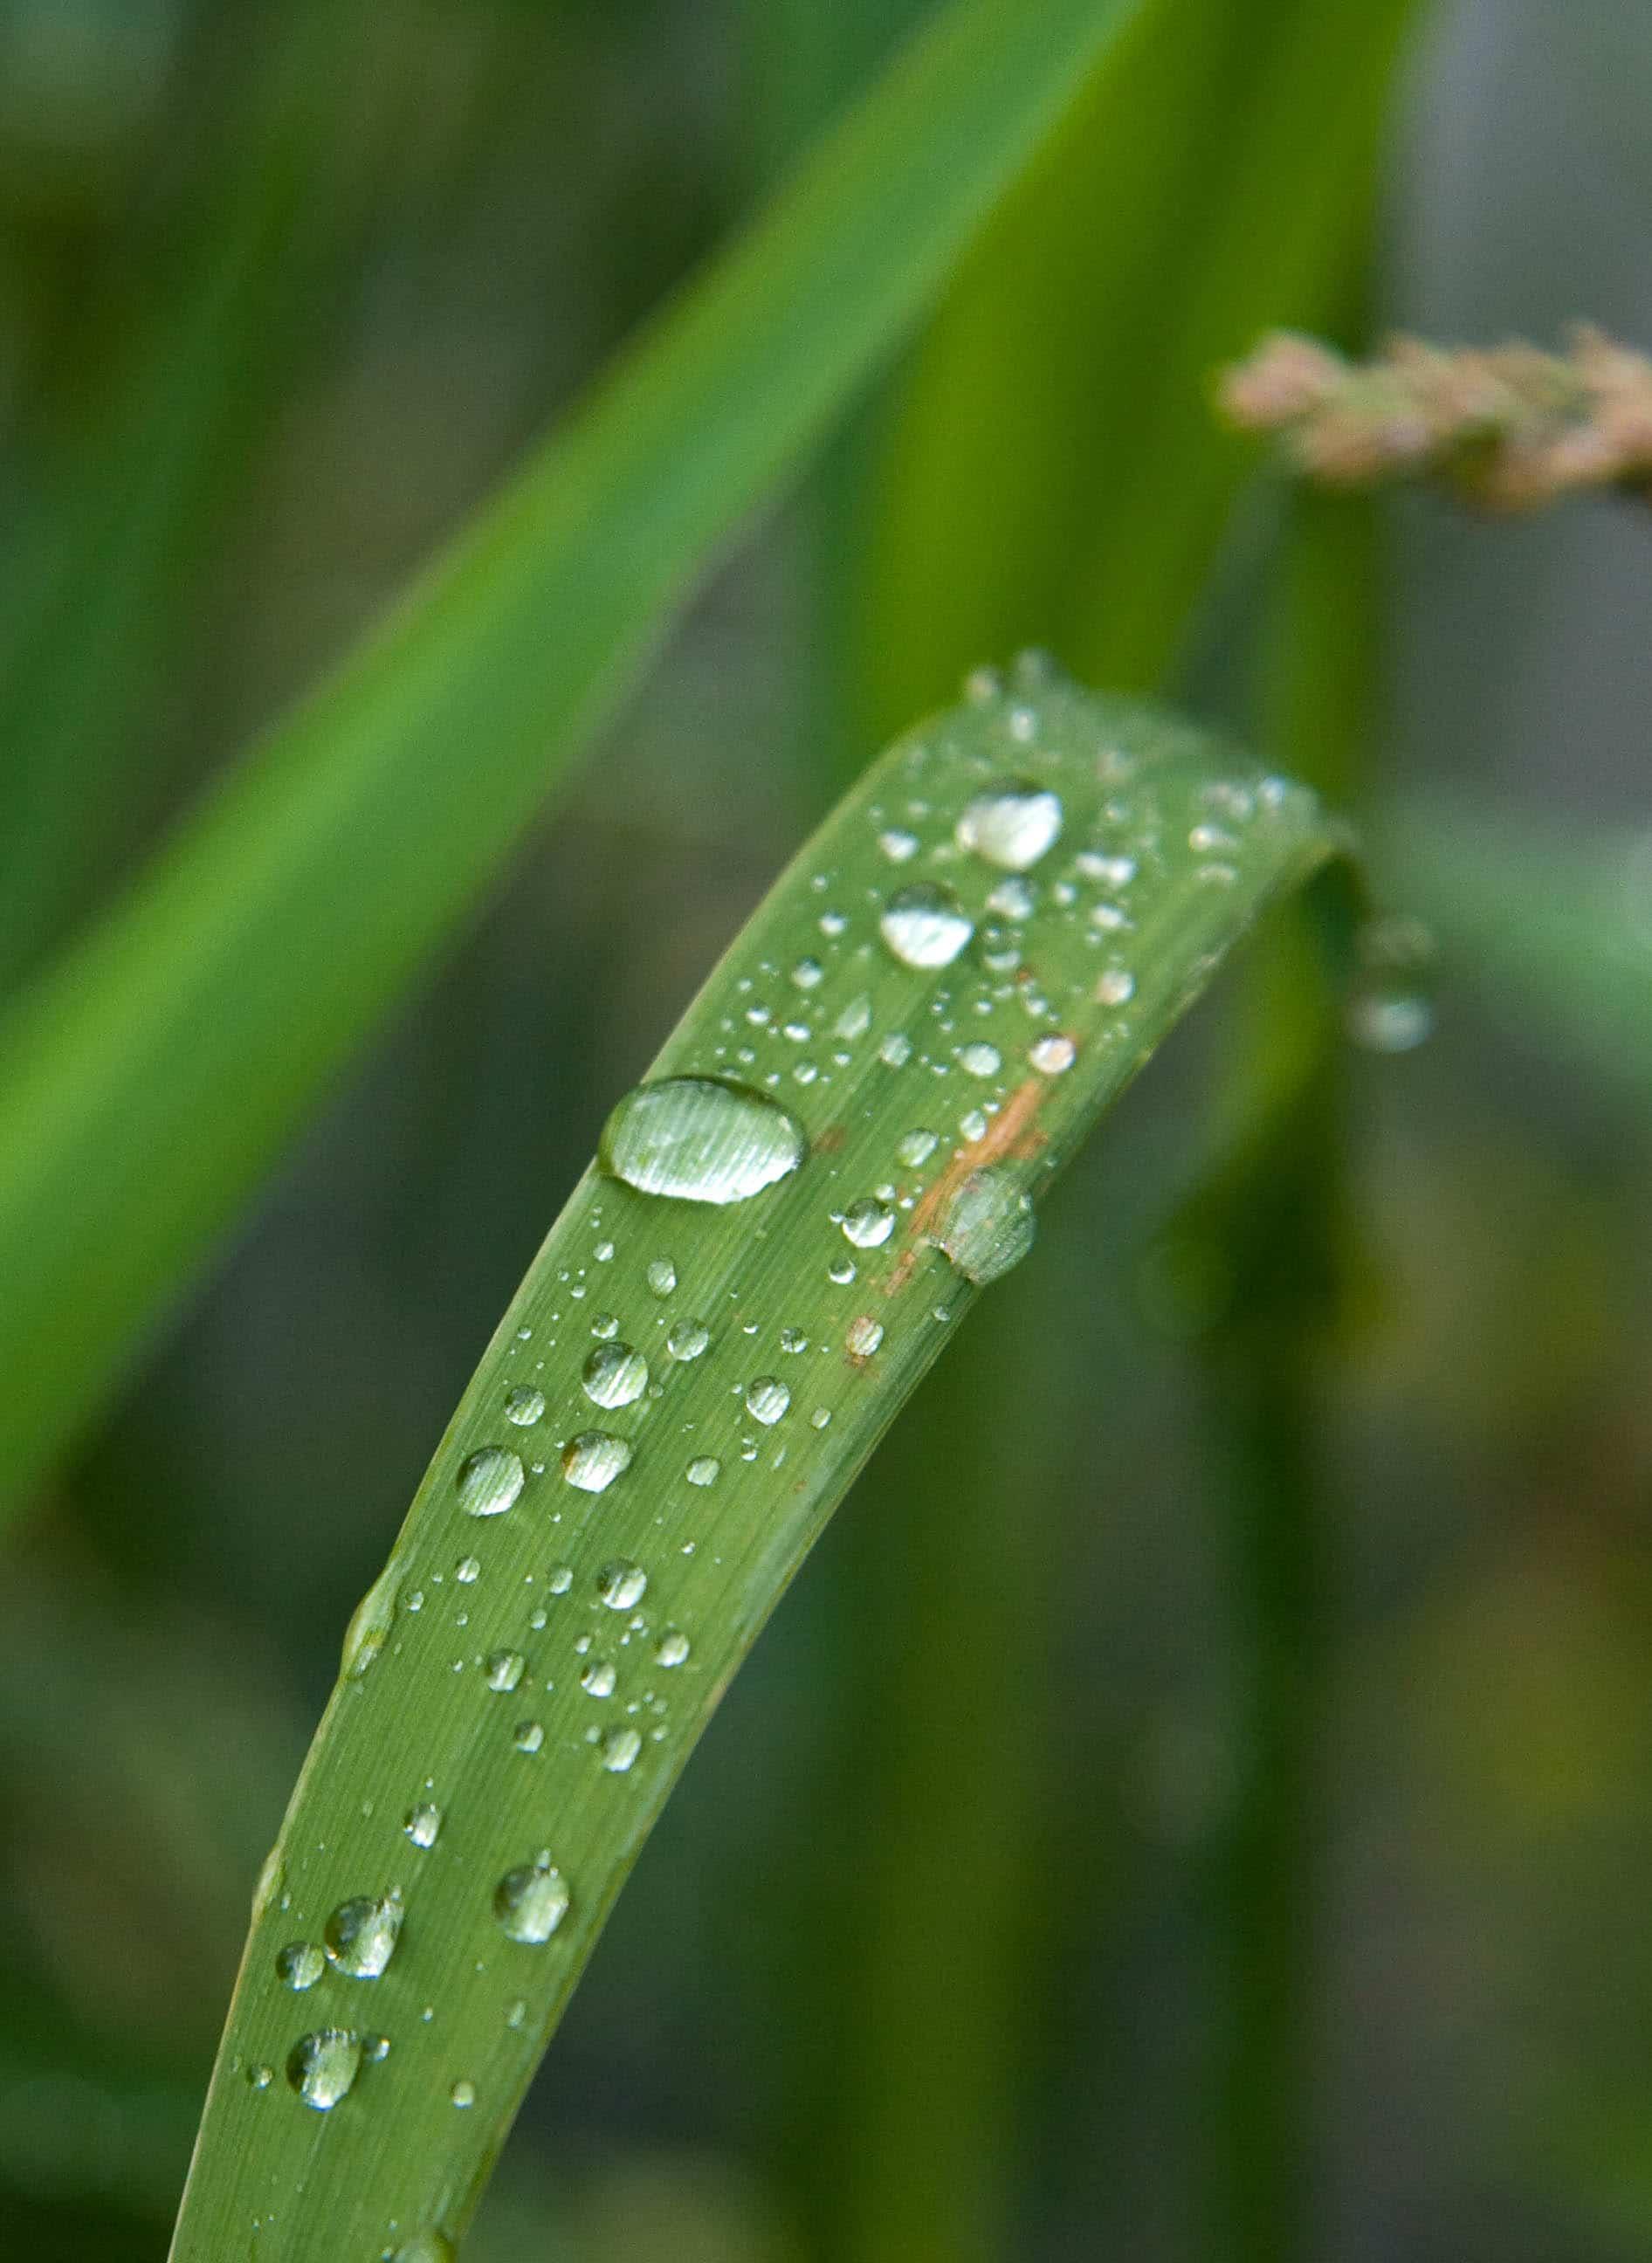 Gras bei Regen